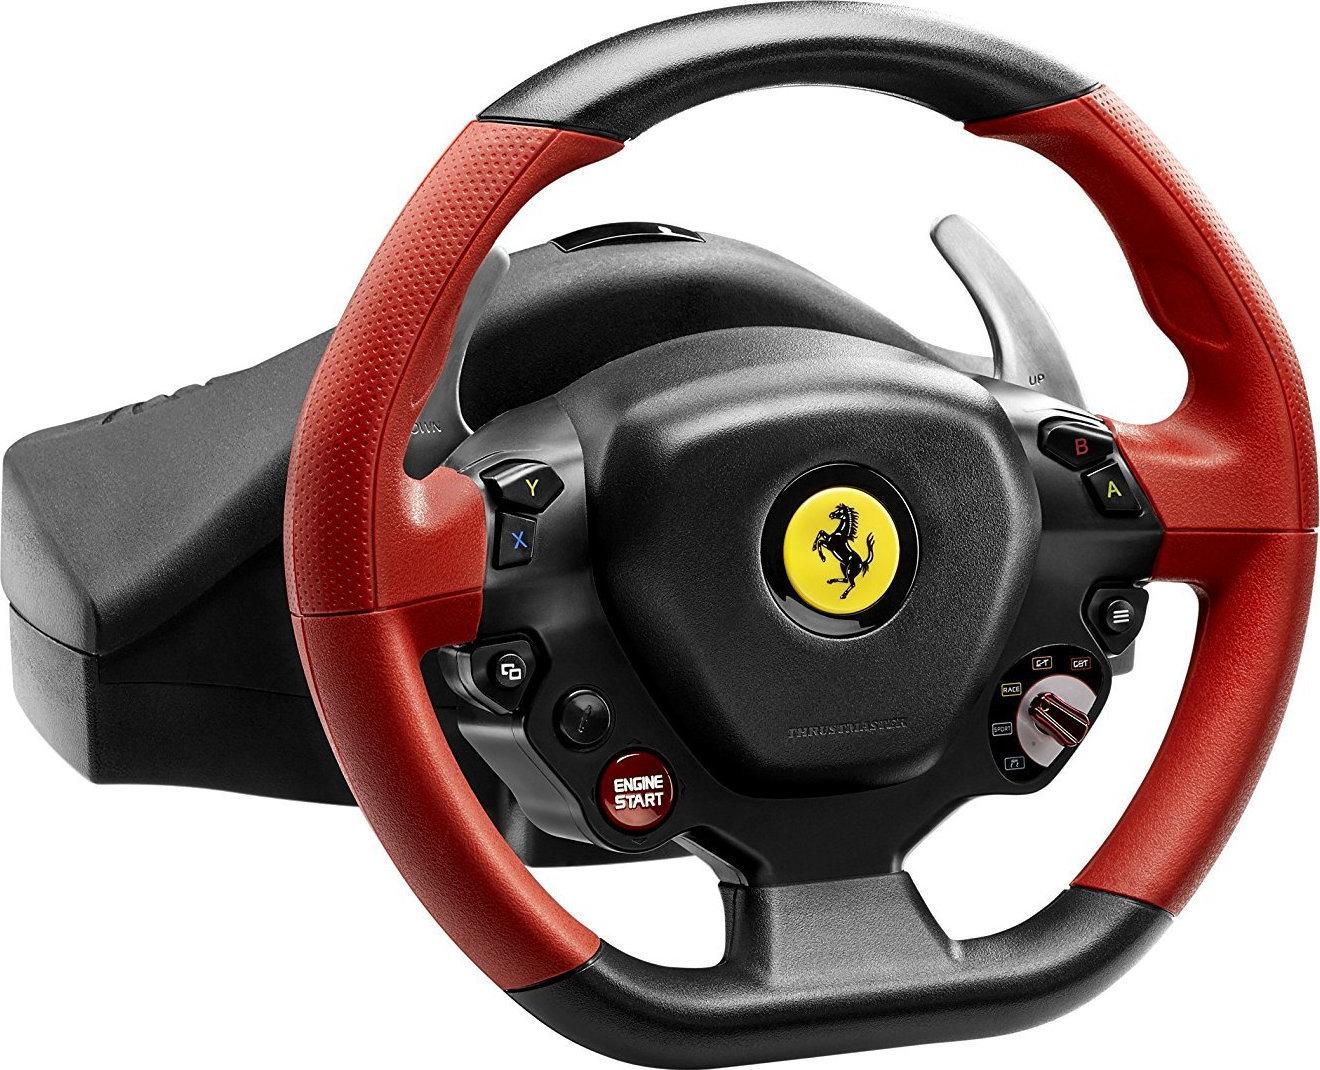 Thrustmaster Ferrari 458 Spider XBOX ONE Τιμονιέρα